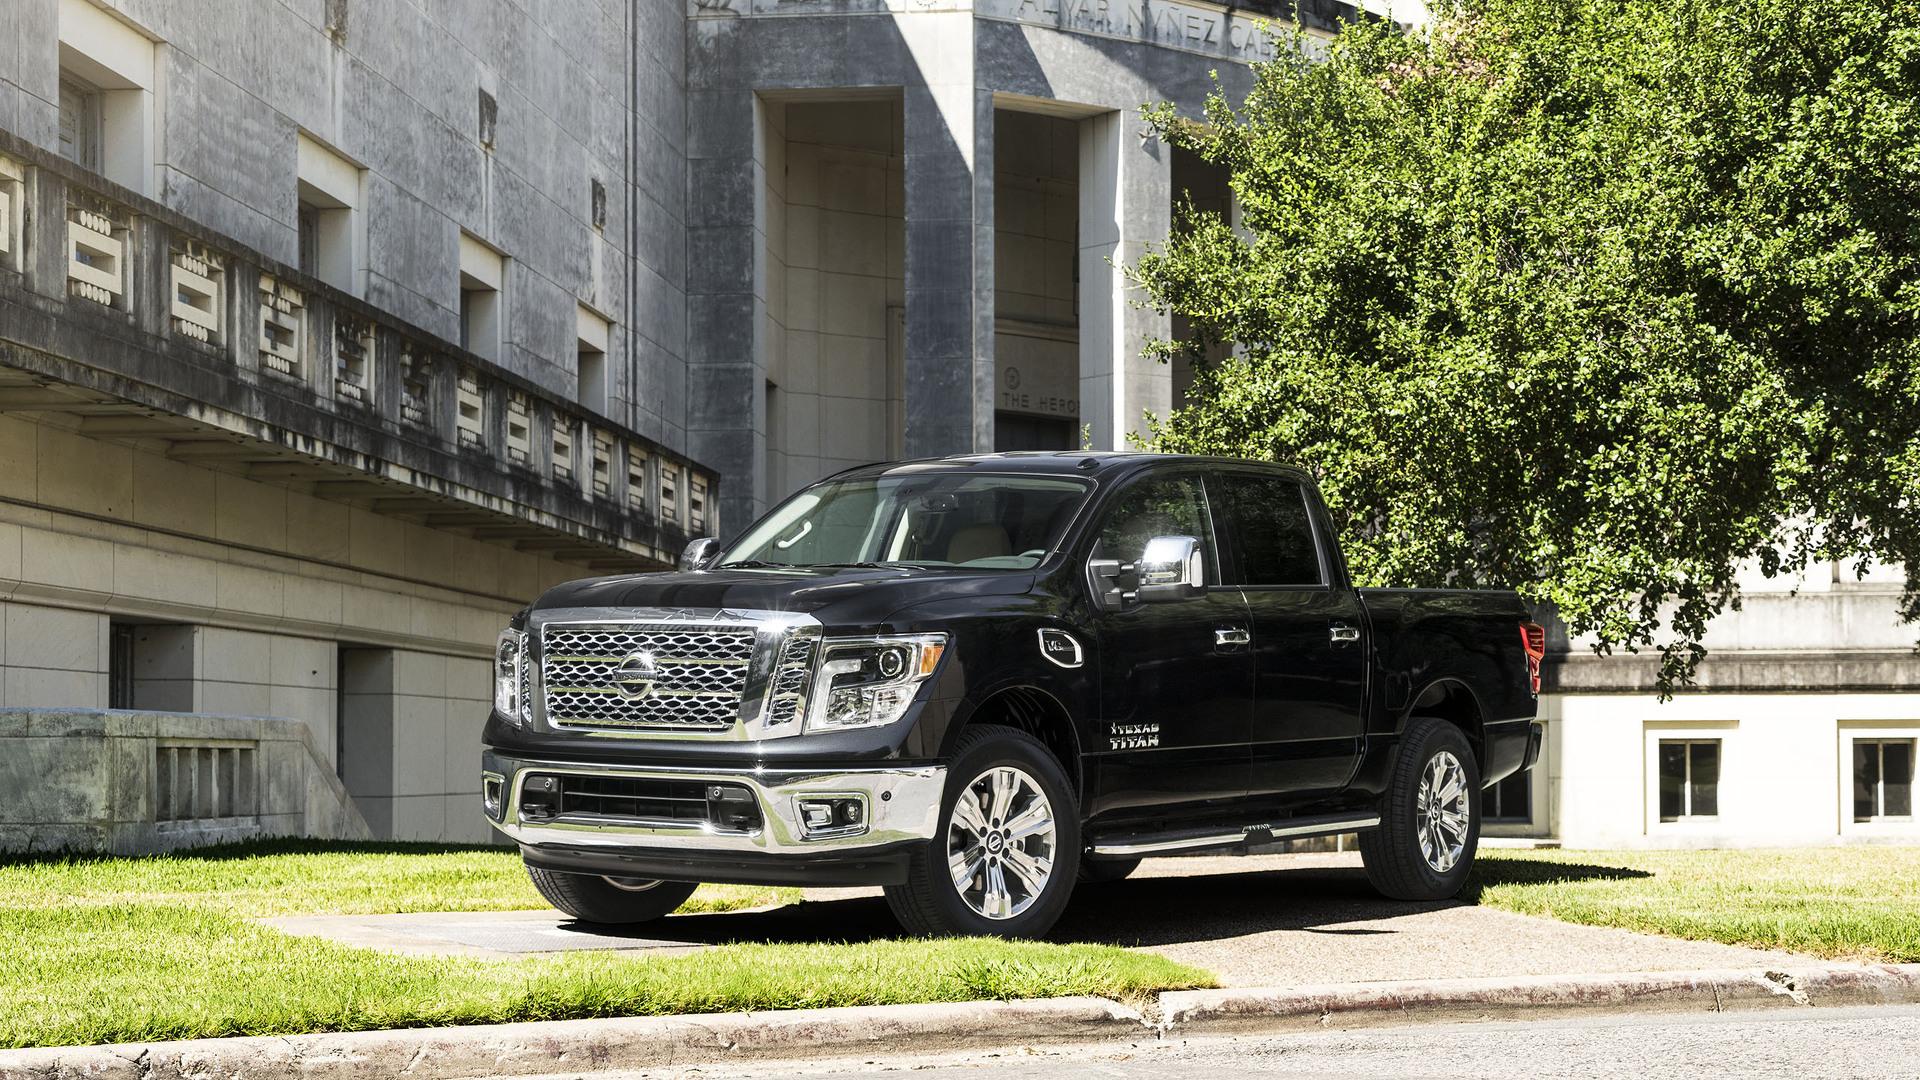 Texas Edition Trucks >> Nissan Texas Titan Edition Trucks Debut With Extra Chrome At